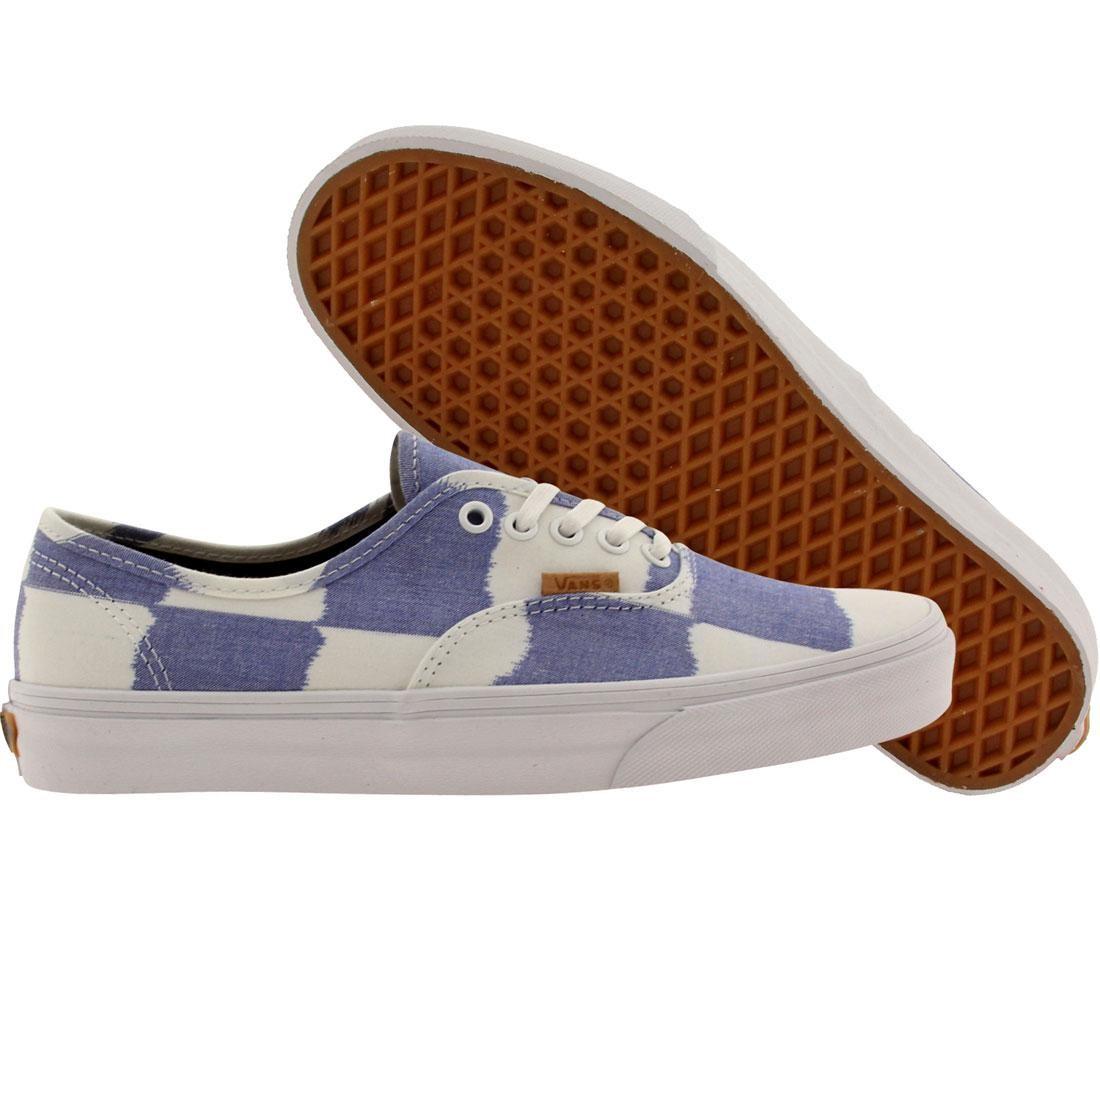 Vans Men Authentic - Glitch Check (blue / white)